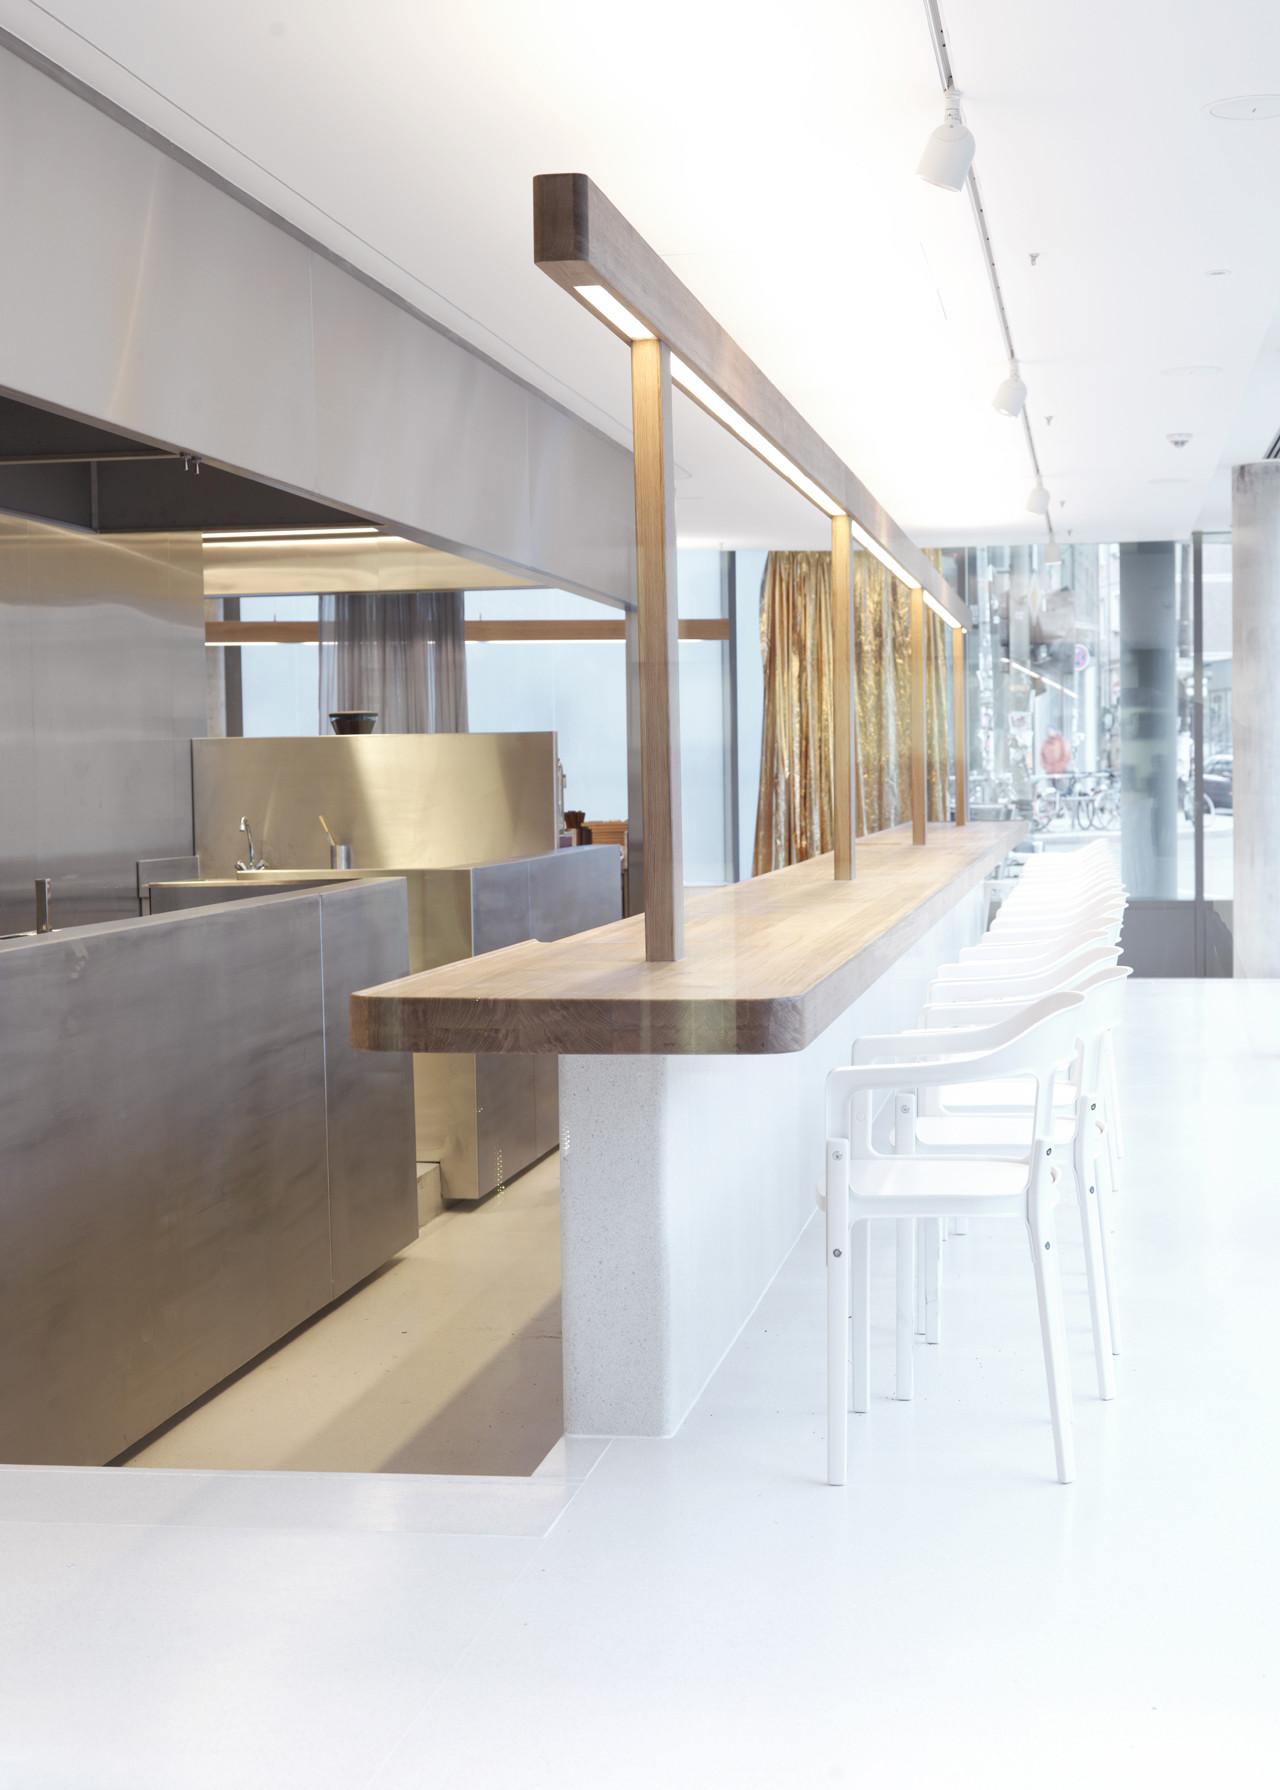 Restaurant Dos Palillos / Estudio Bouroullec, © Tahon & Bouroullec